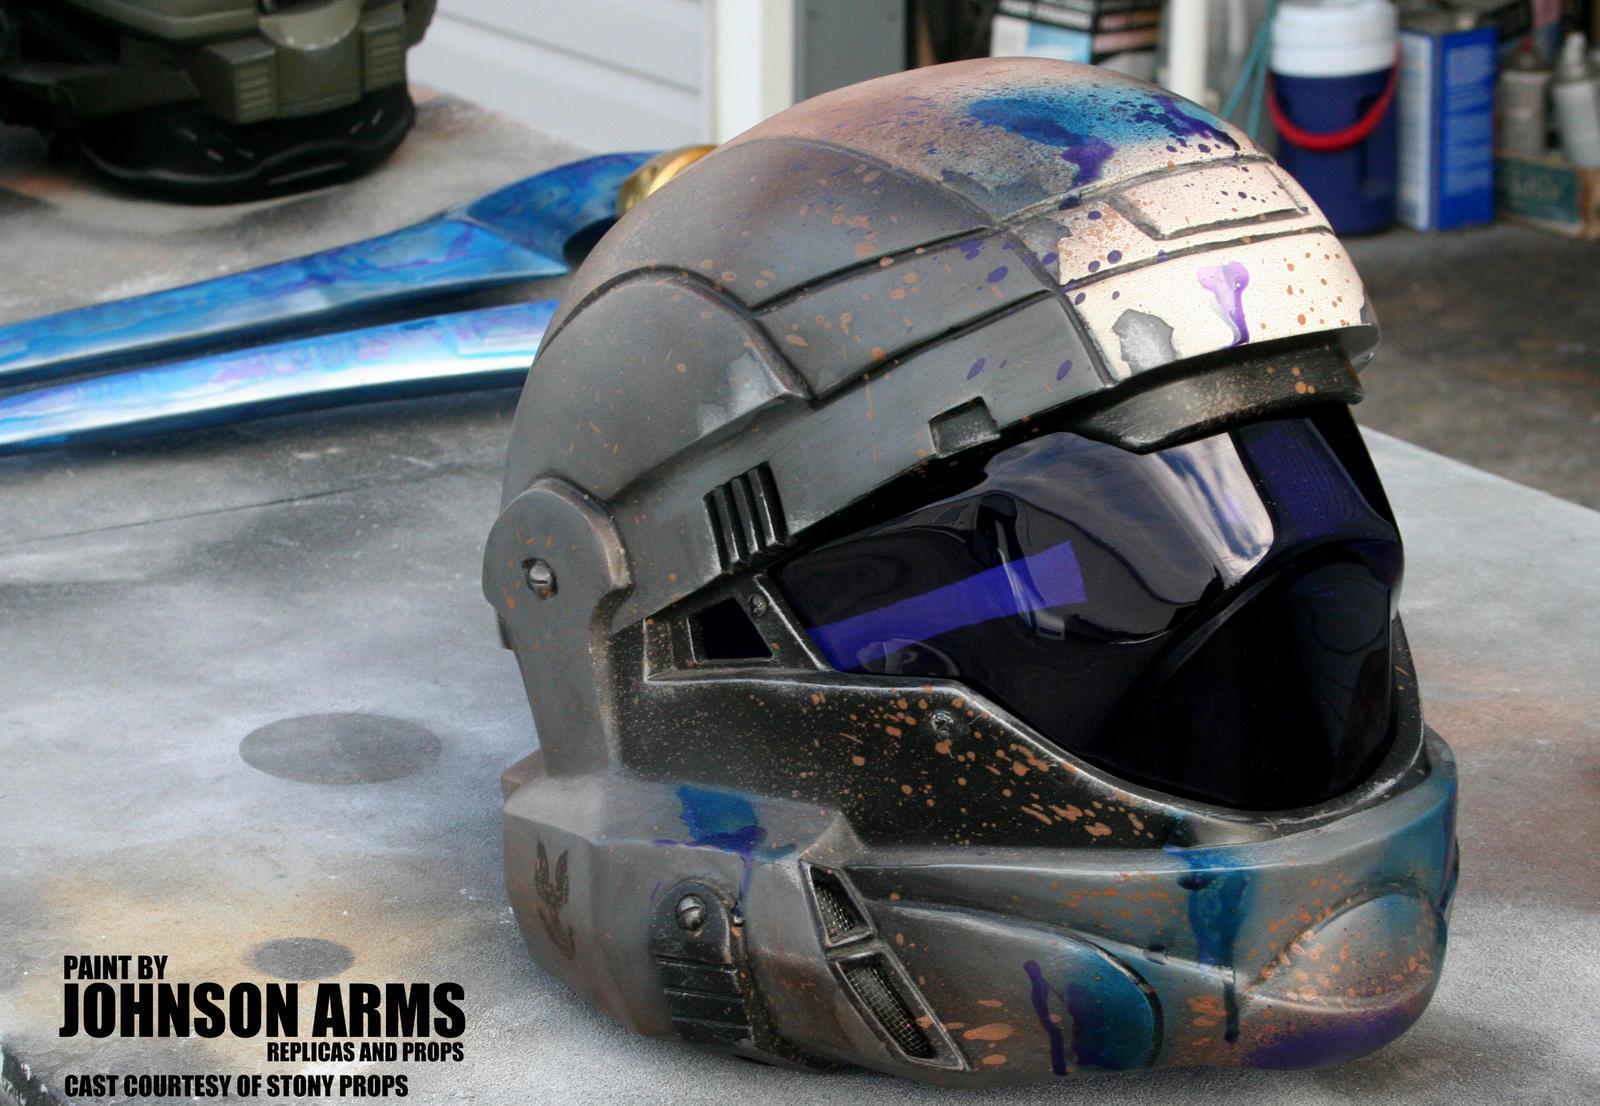 Halo favourites by MegatheZealot on DeviantArt